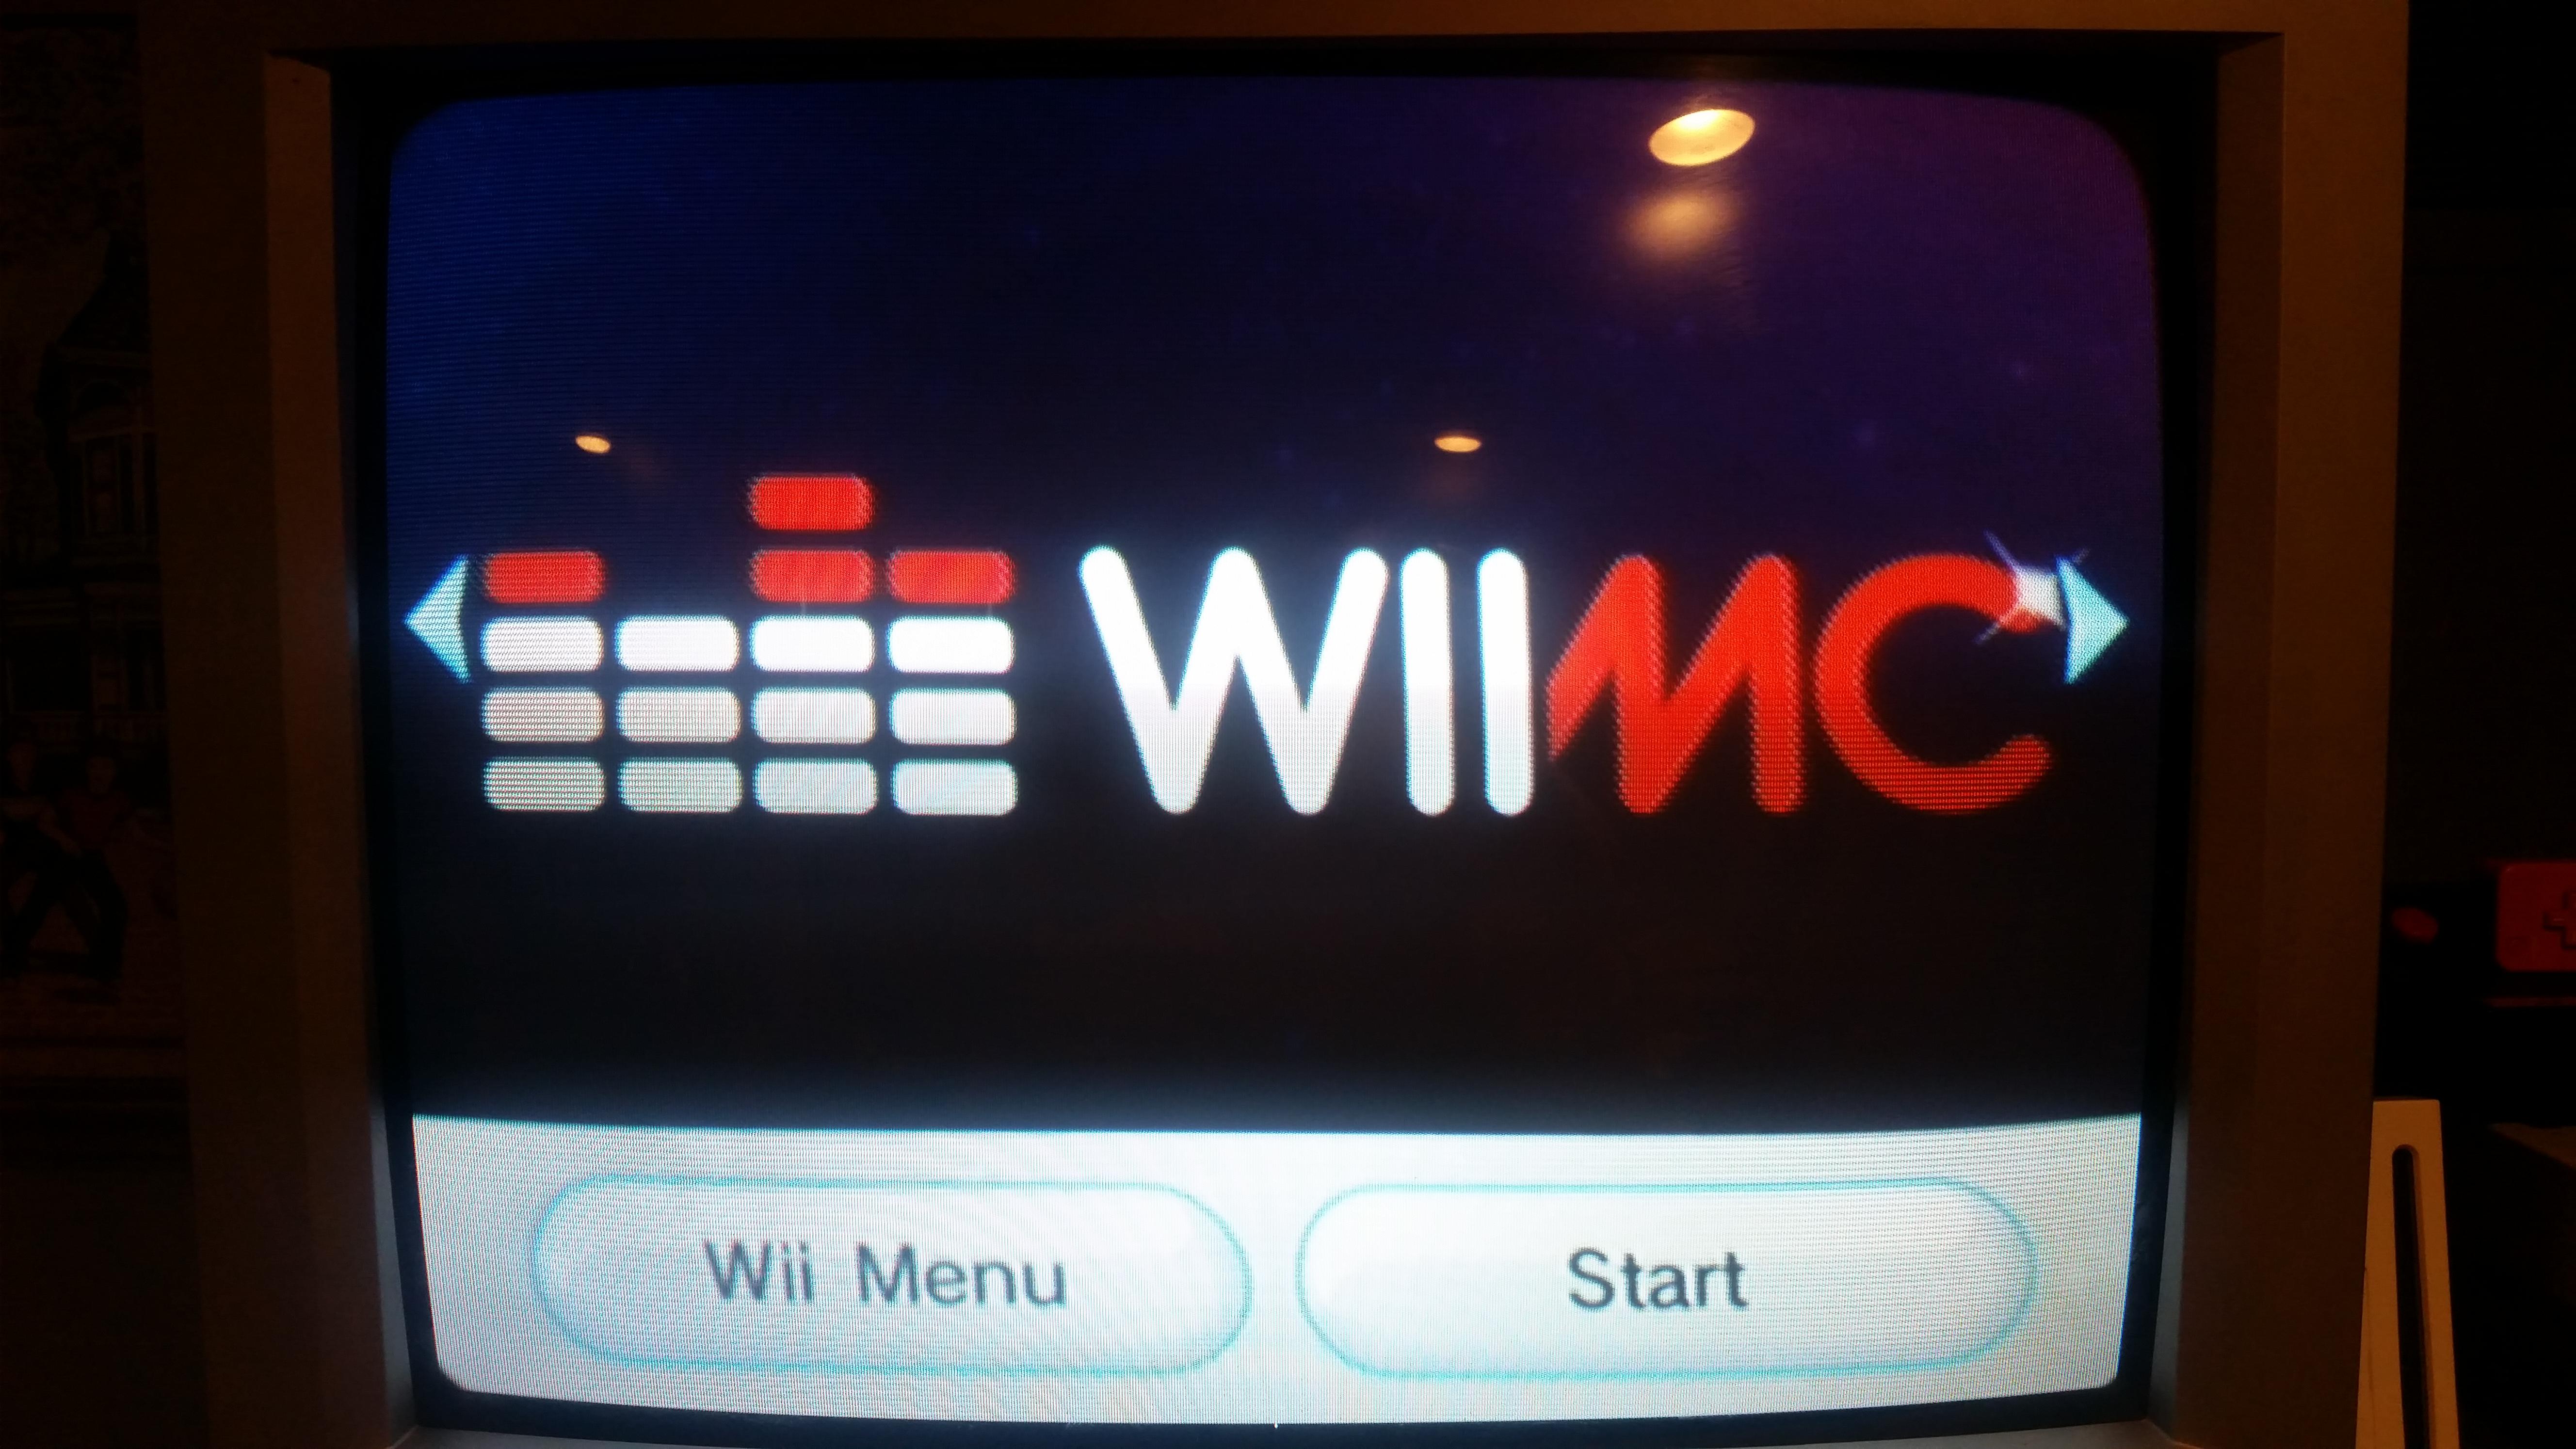 WiiMC Start Pic